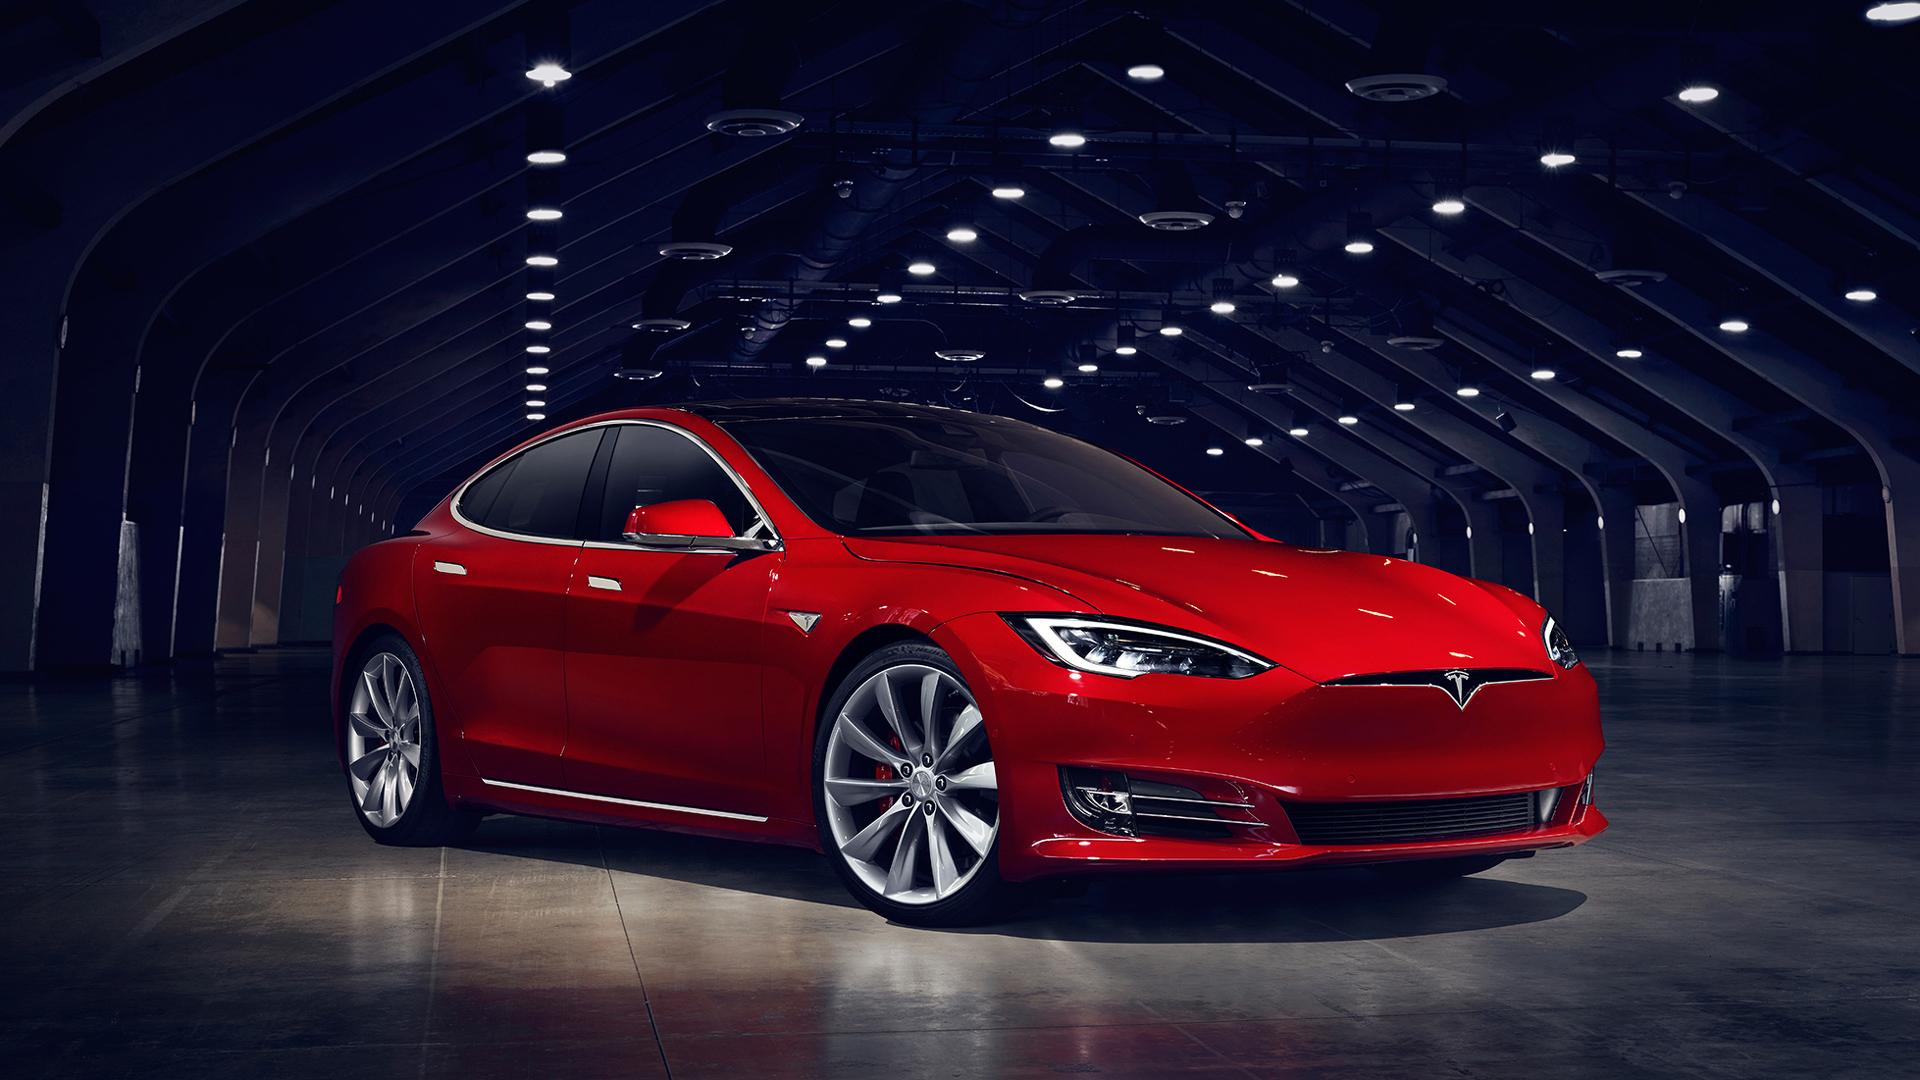 Tesla Model S Wallpaper